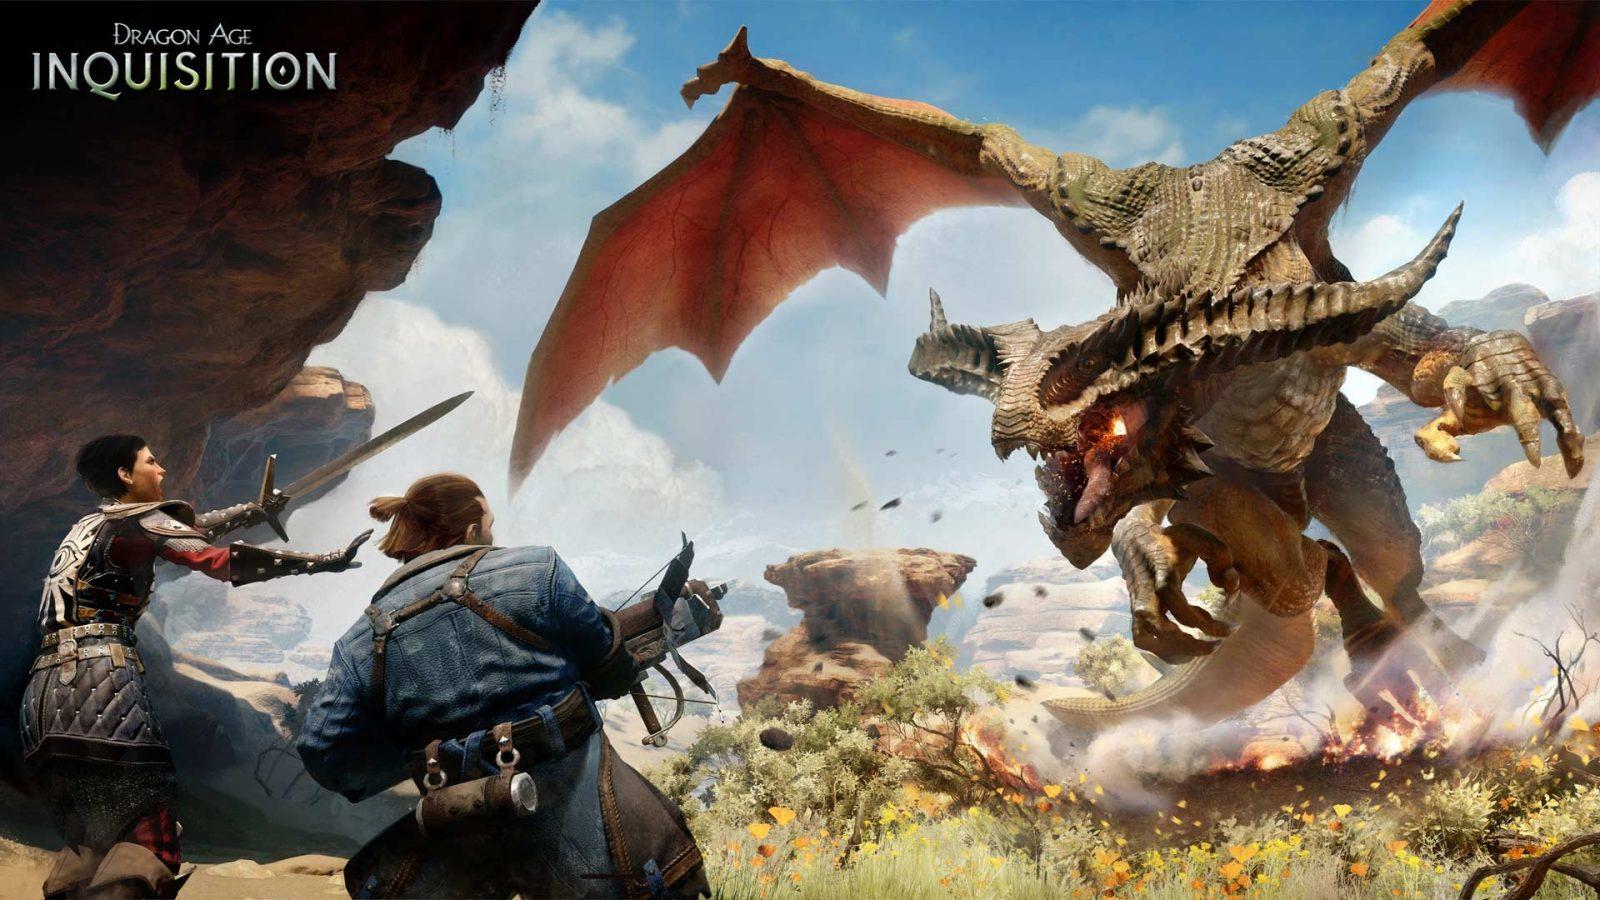 Games/Apps: Dragon Age Inquisition $30, Skylanders Trap Team Wii U